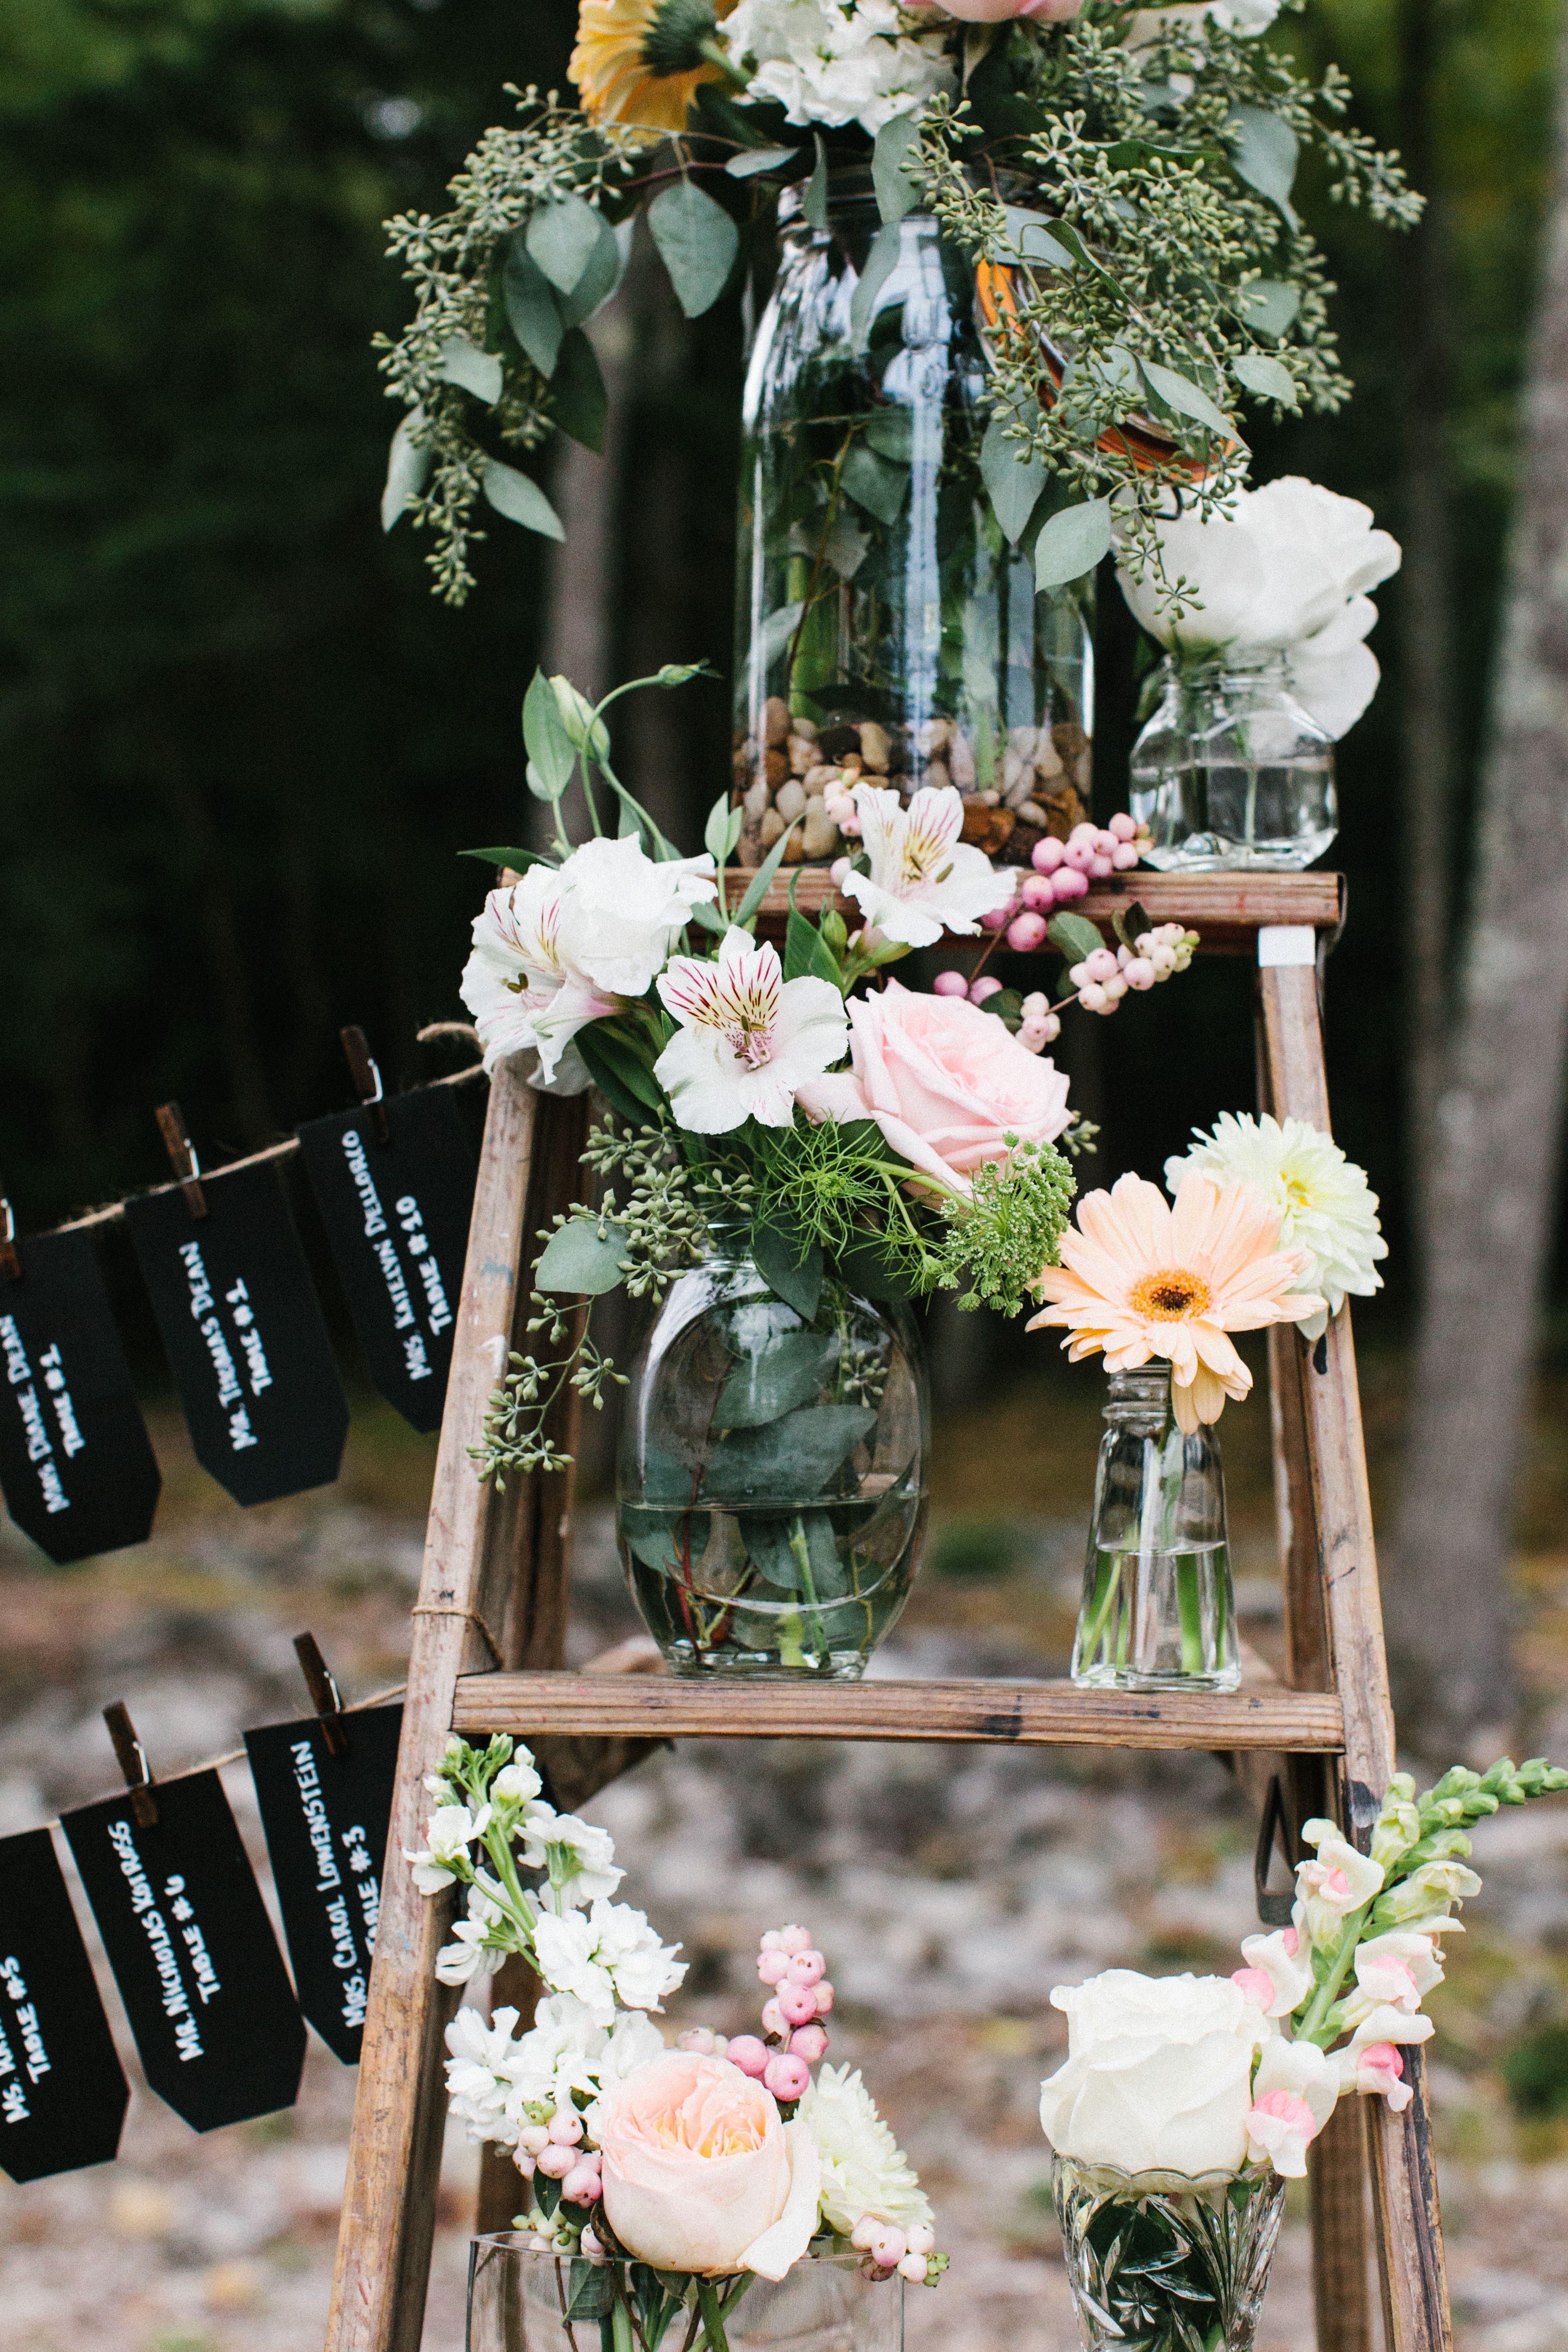 Backgrounds diy wedding in philippines of months androids high resolution vintage ladder escort card display decor jardin